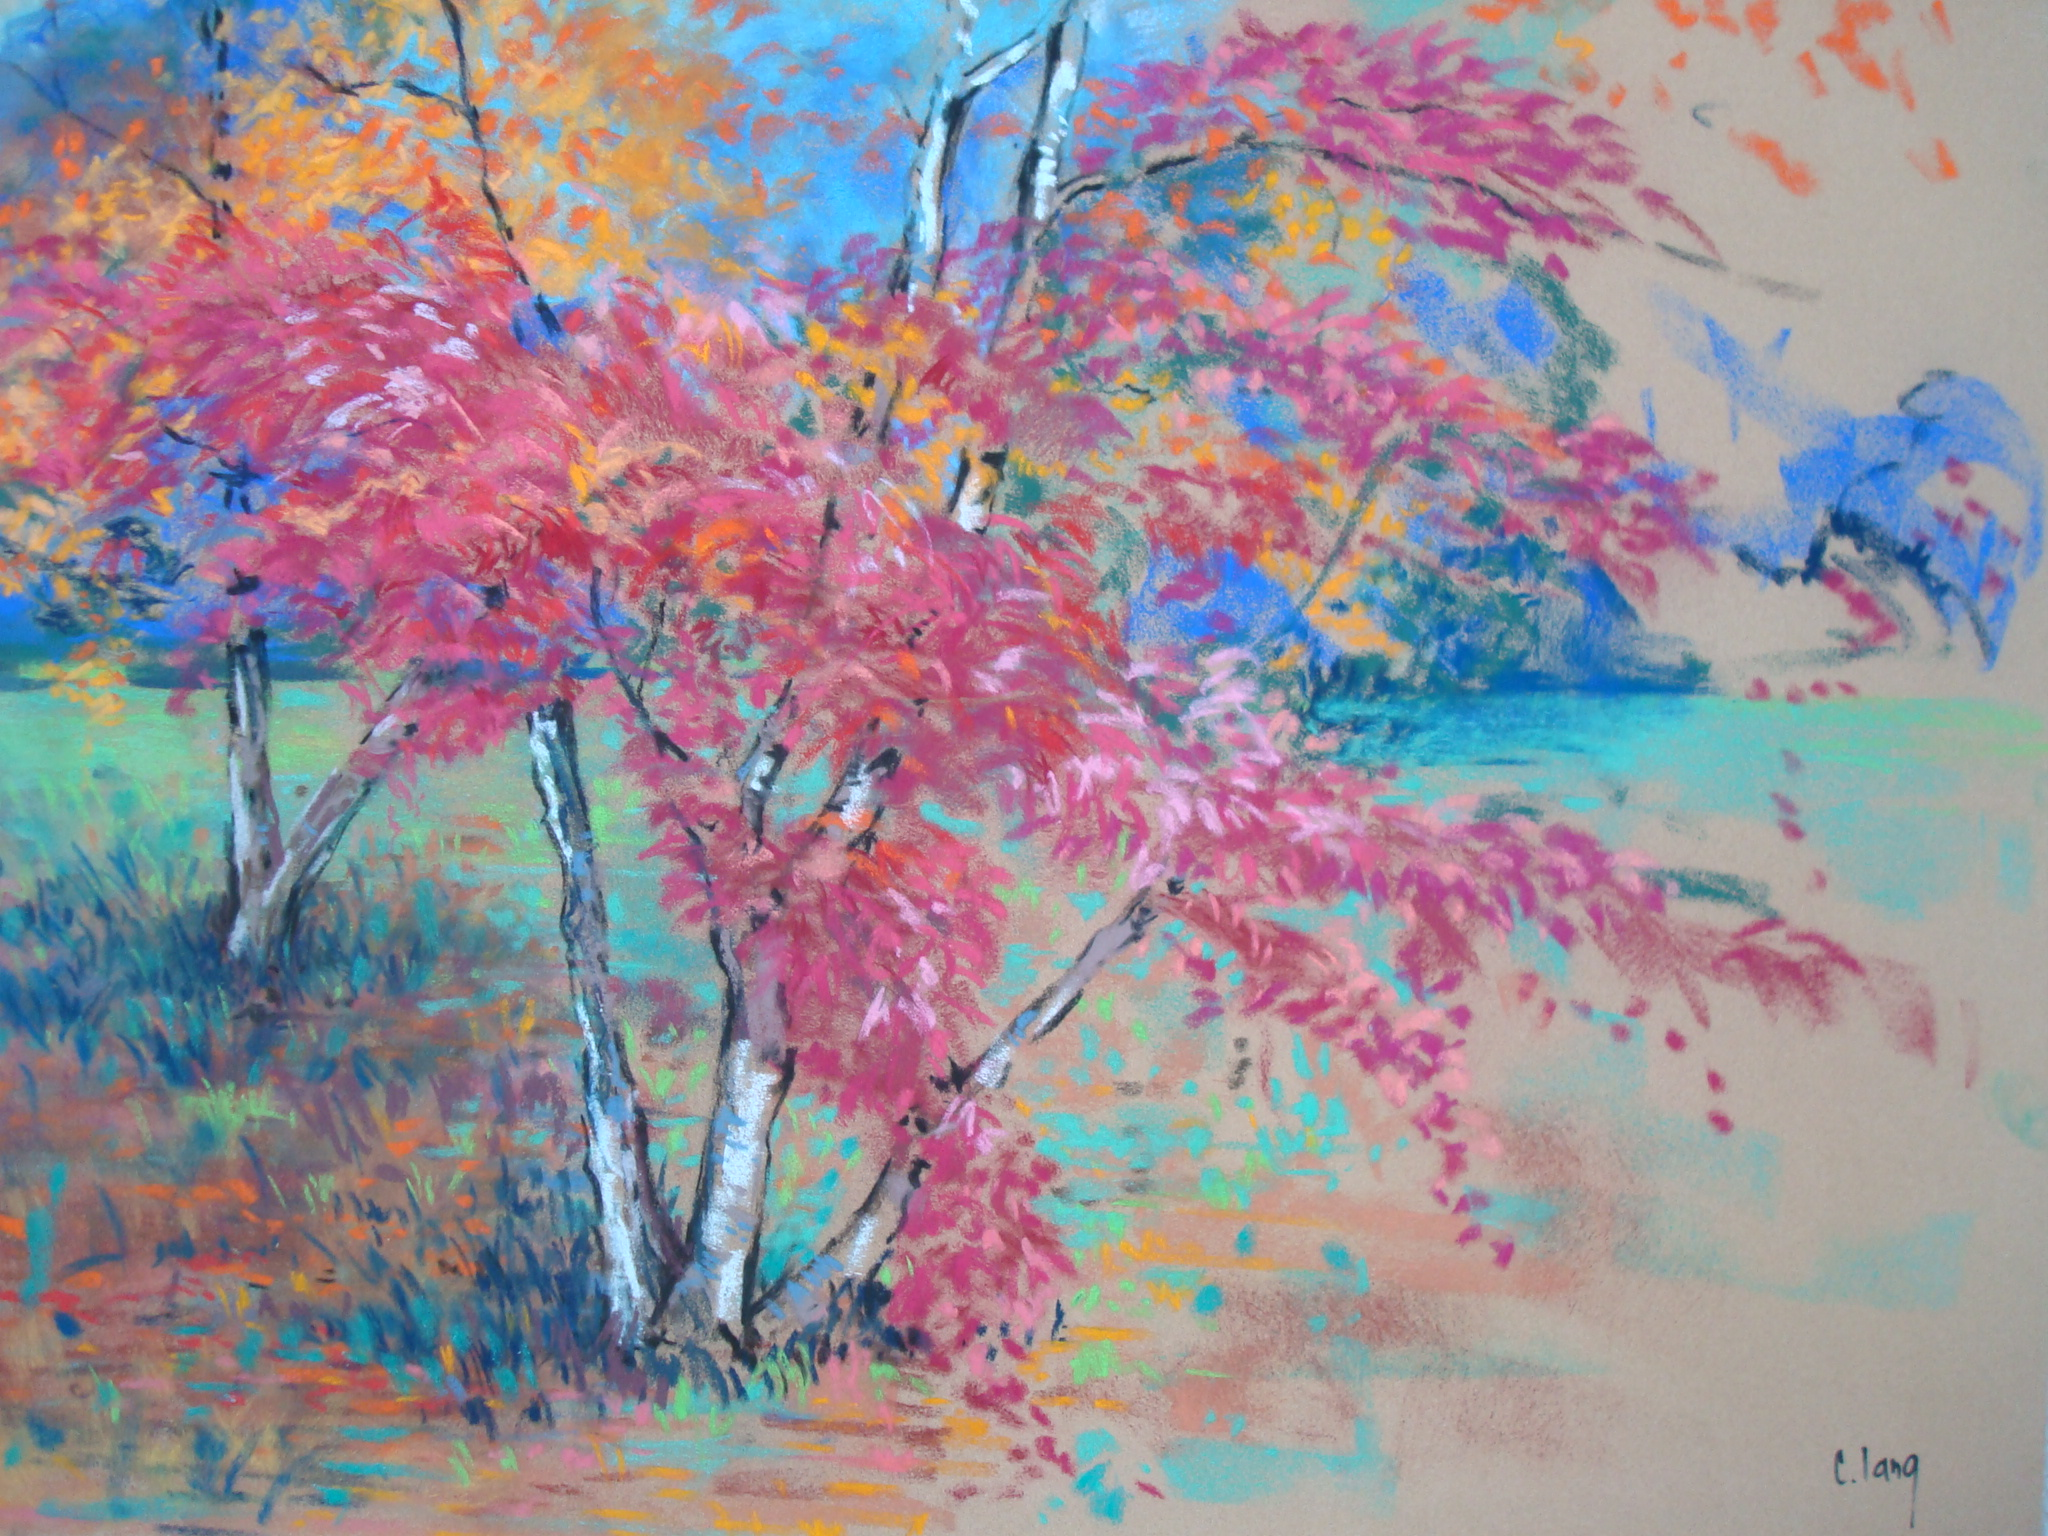 Pastel Clang Artiste Peintre Page 2